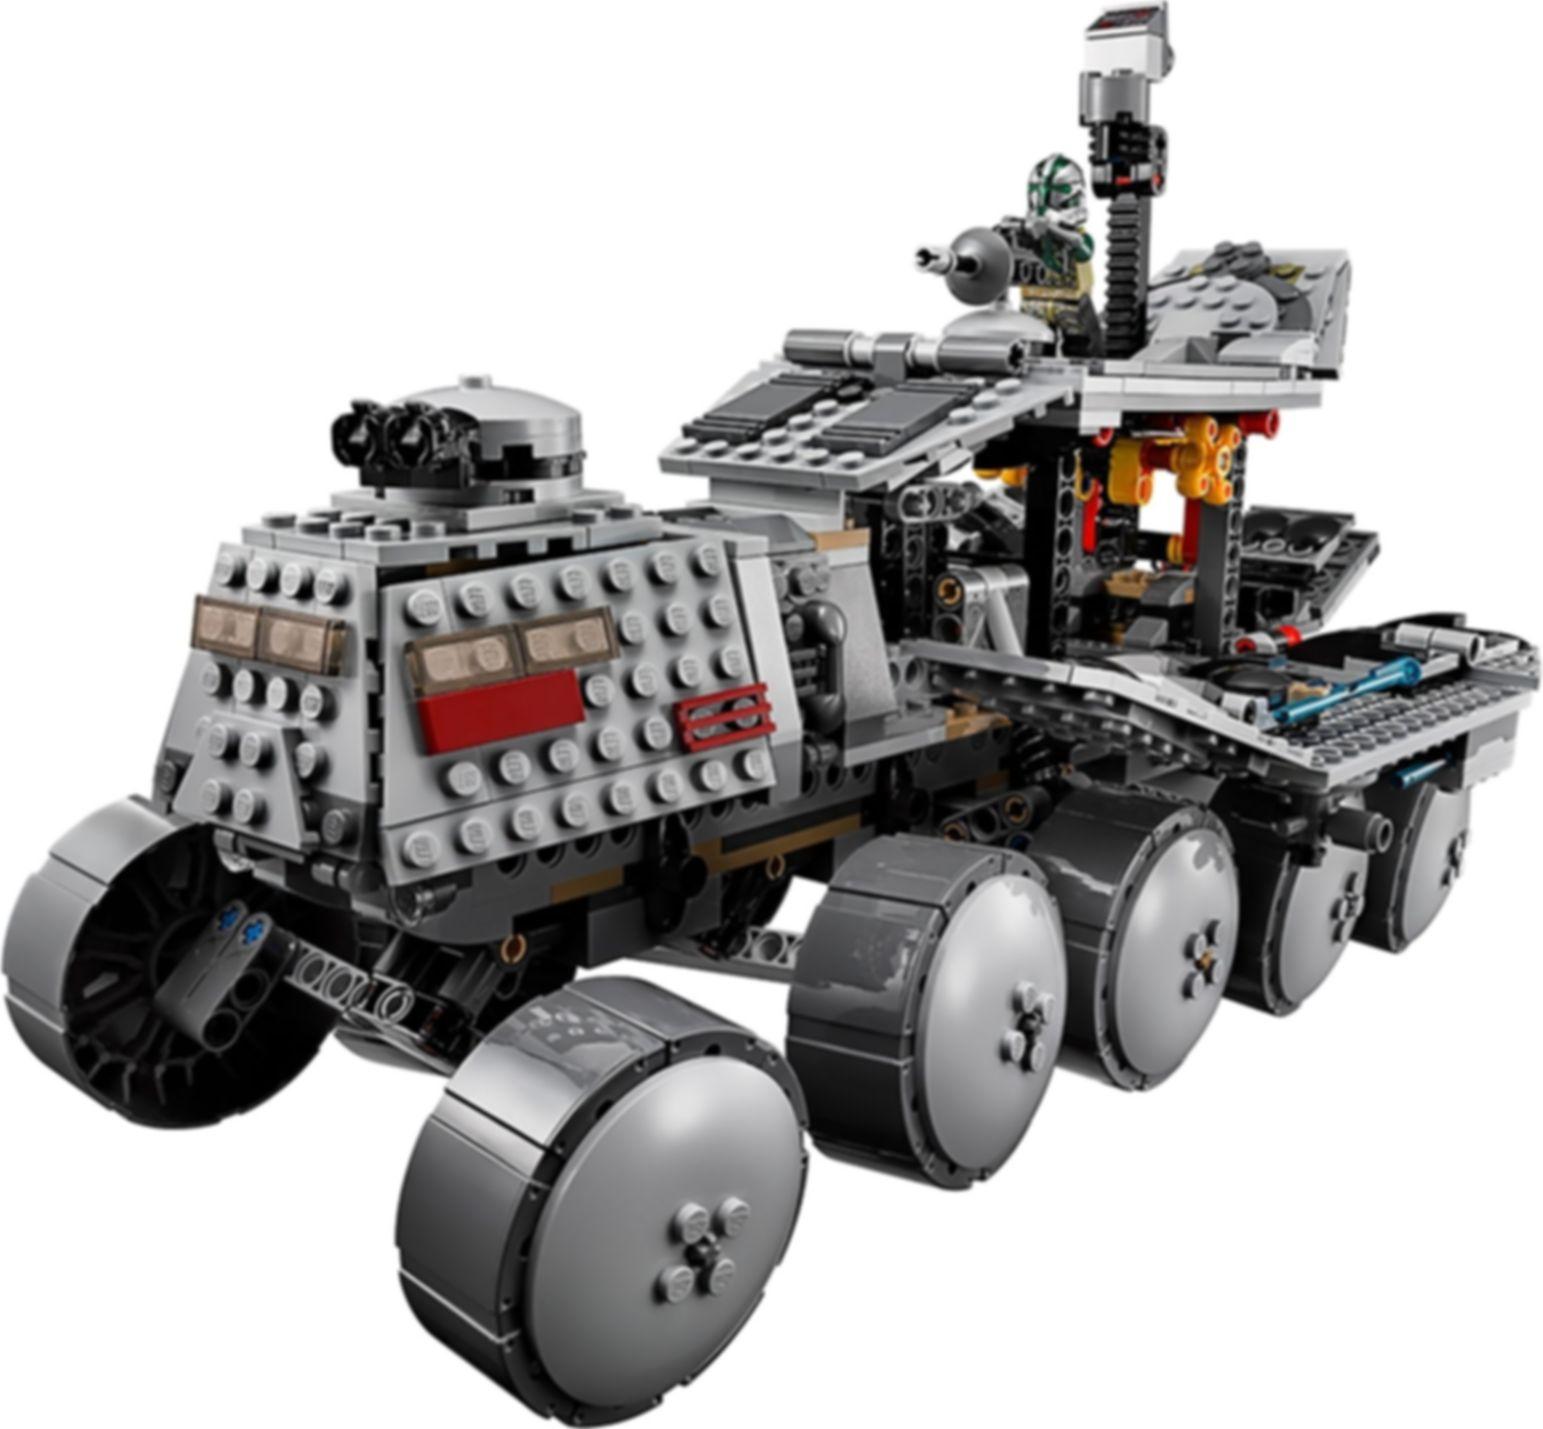 Clone Turbo Tank™ components